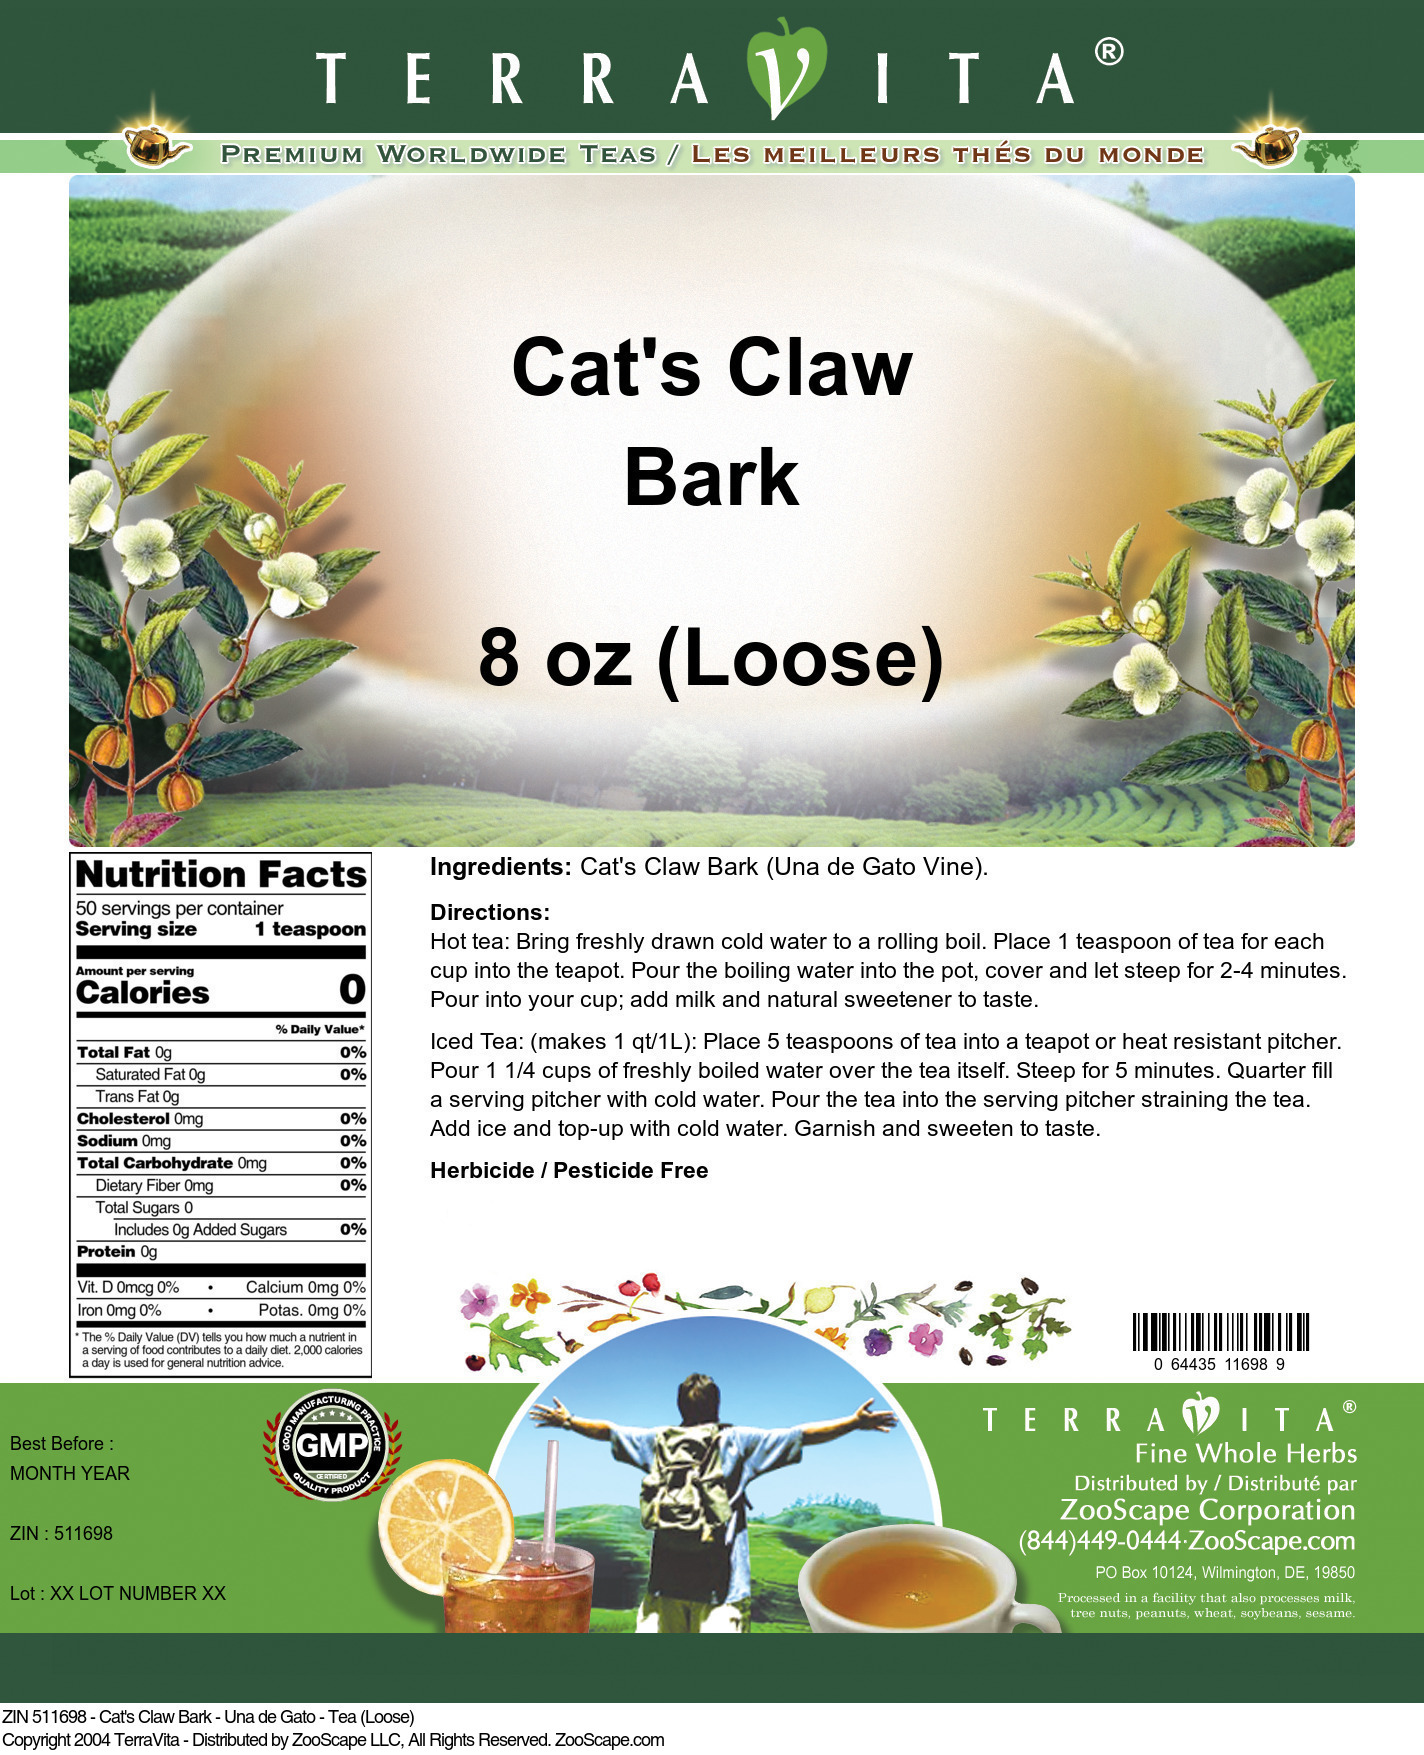 Cat's Claw Bark - Una de Gato - Tea (Loose)